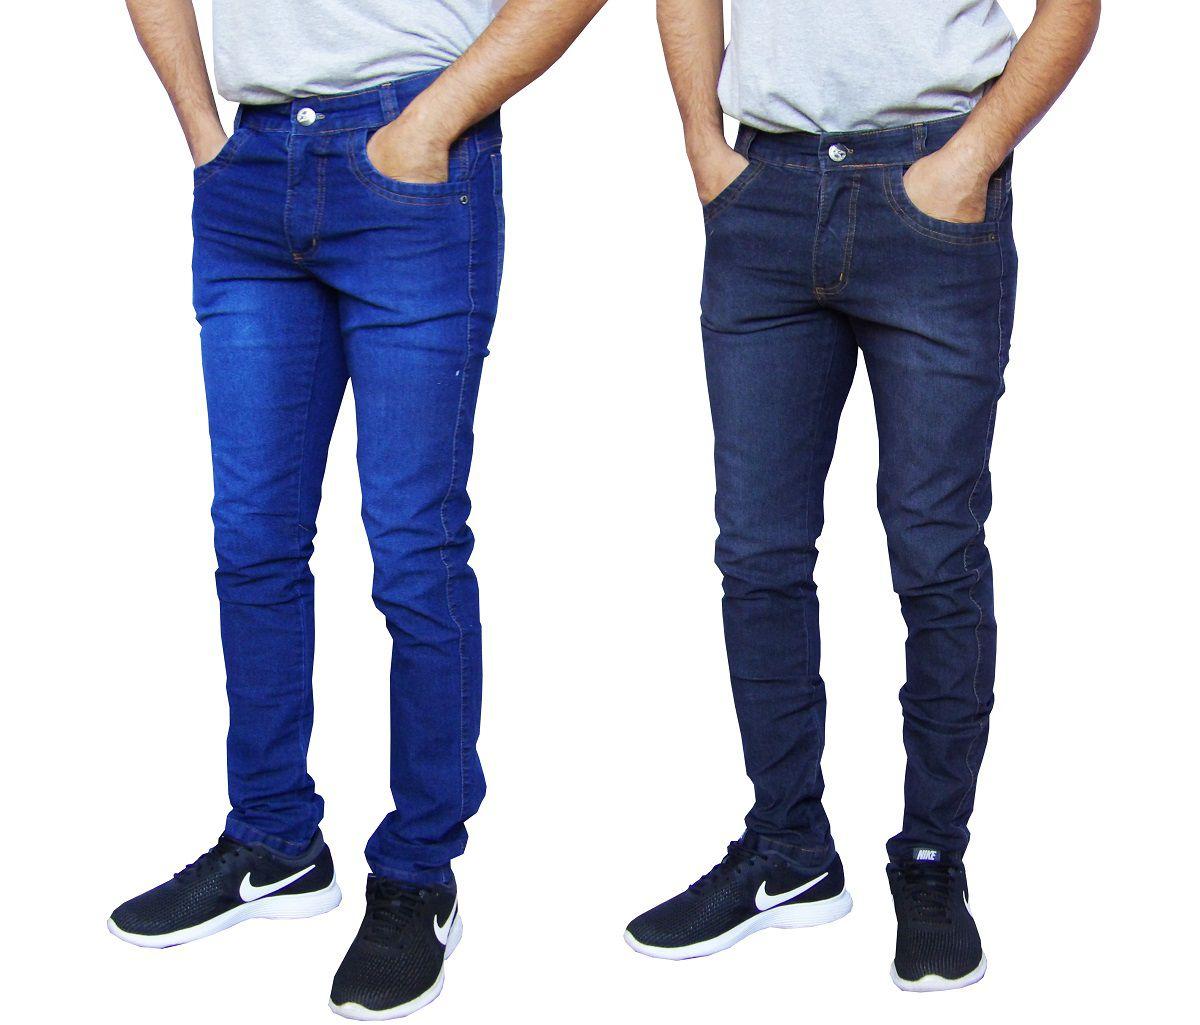 f01cf2bcdf Calça Jeans Masculinas Pronta Entrega - GRUPO VNSGA